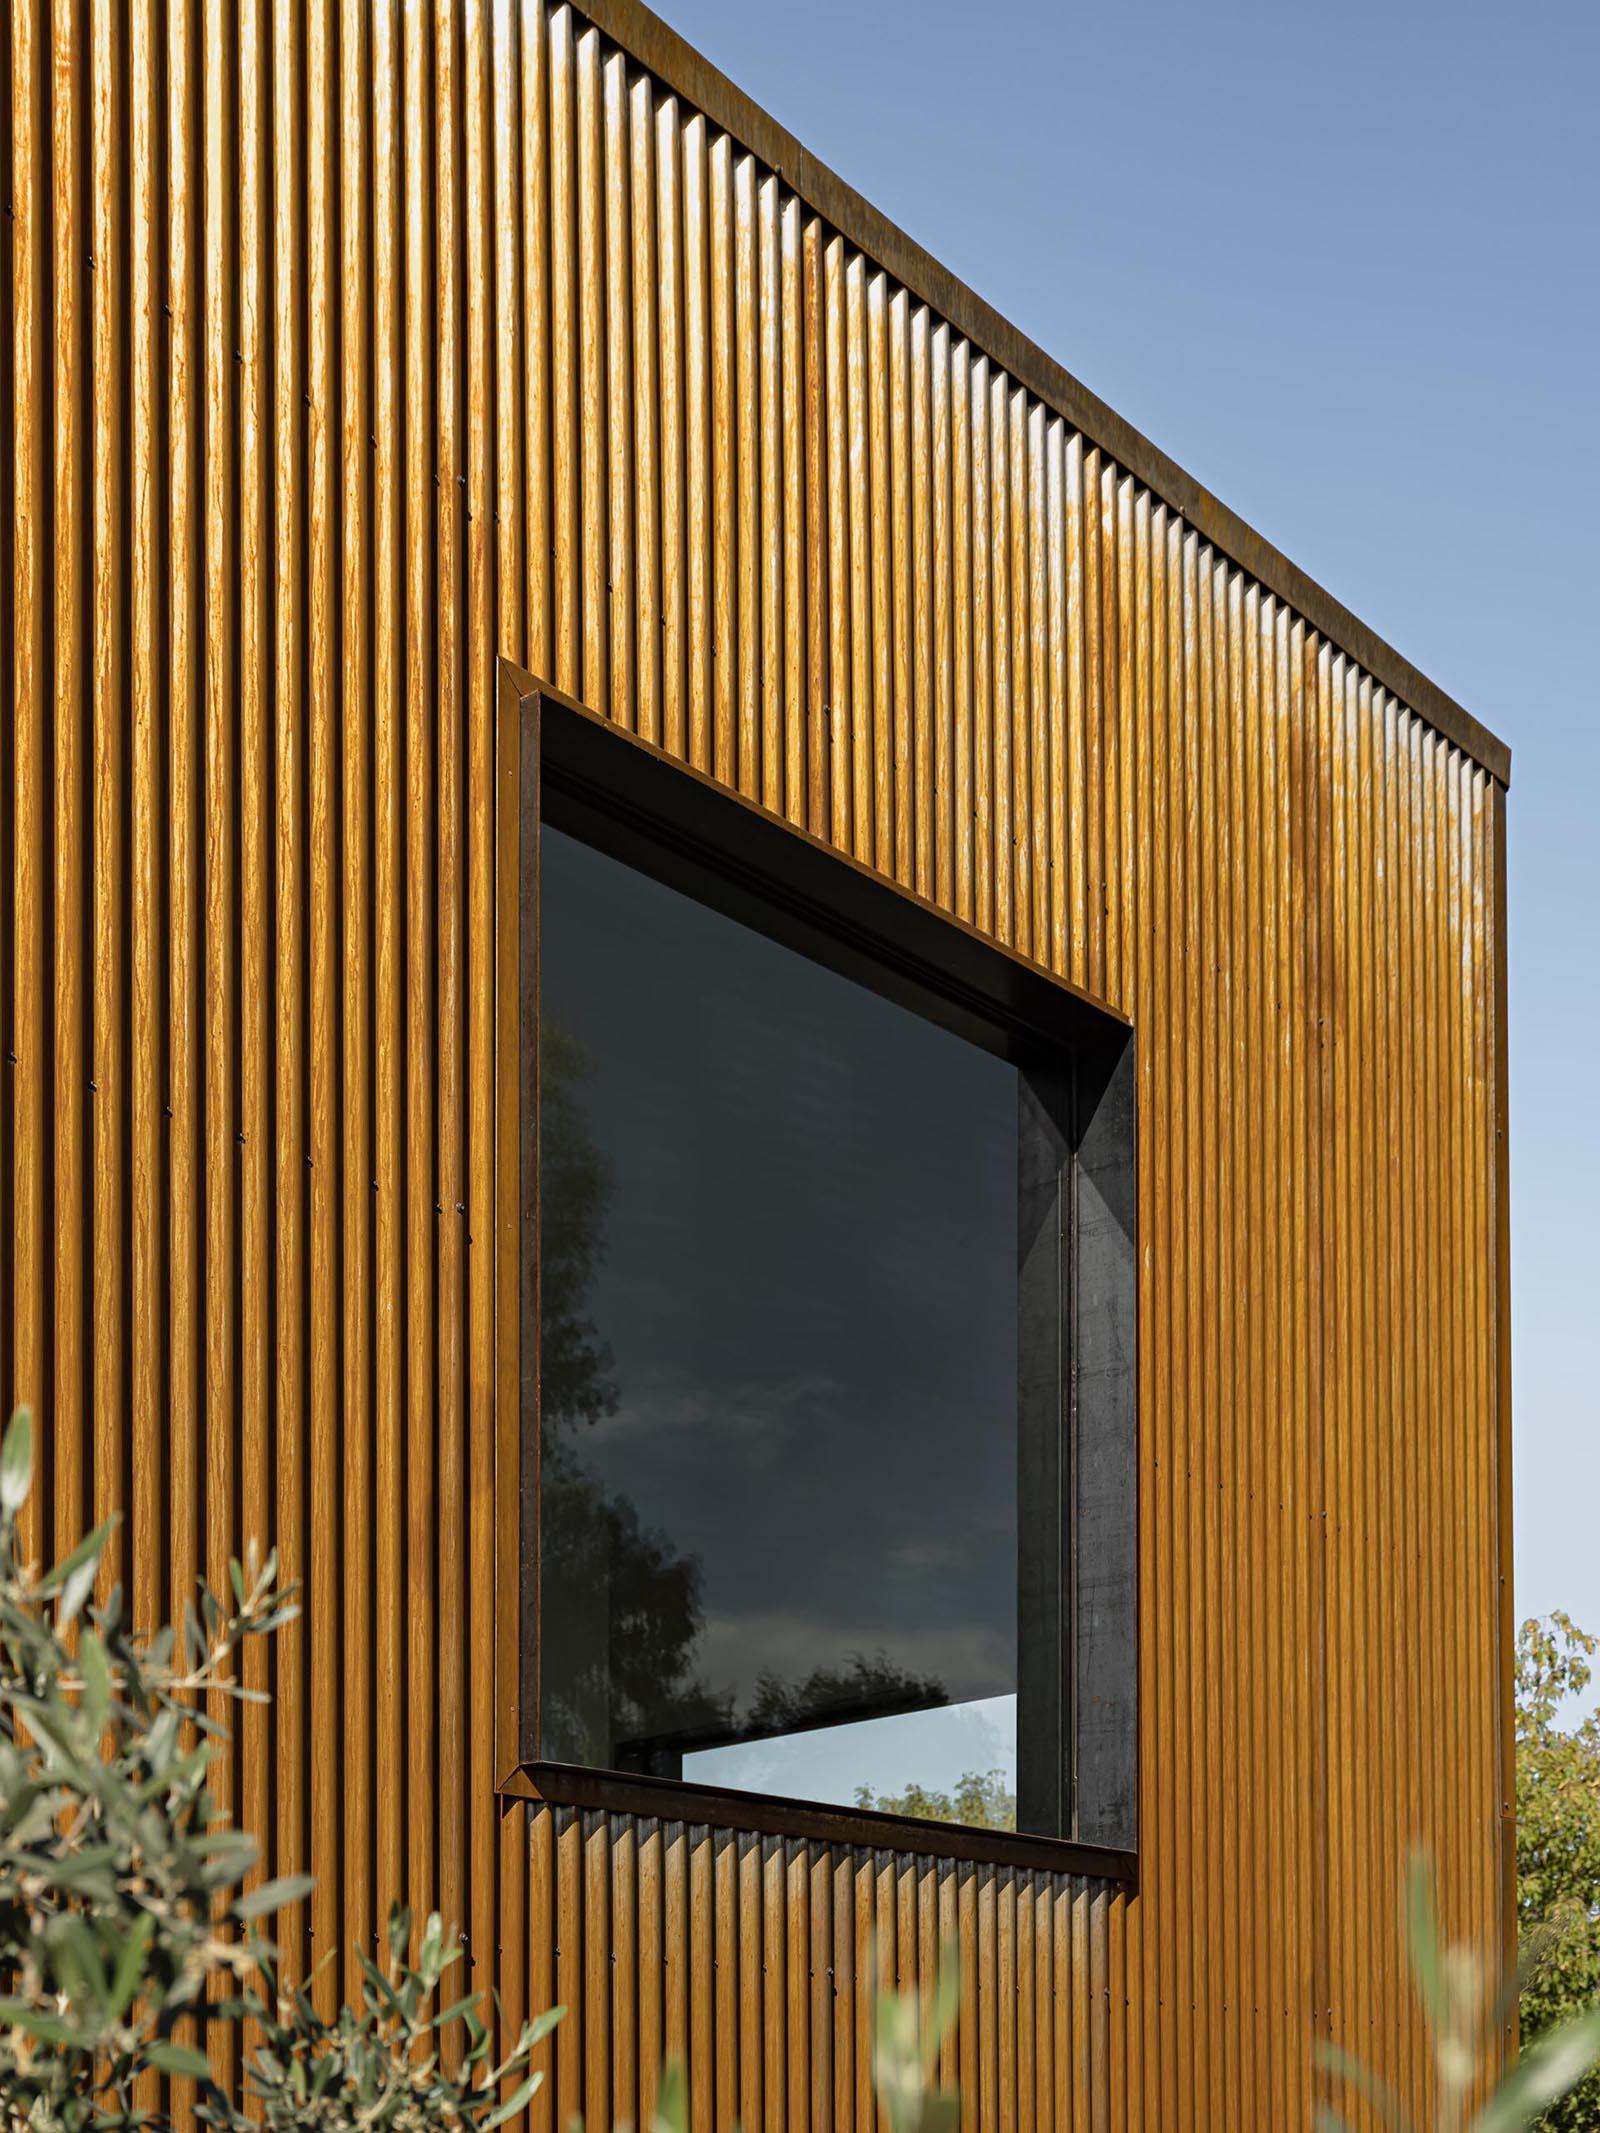 Weathered corrugated metal siding.